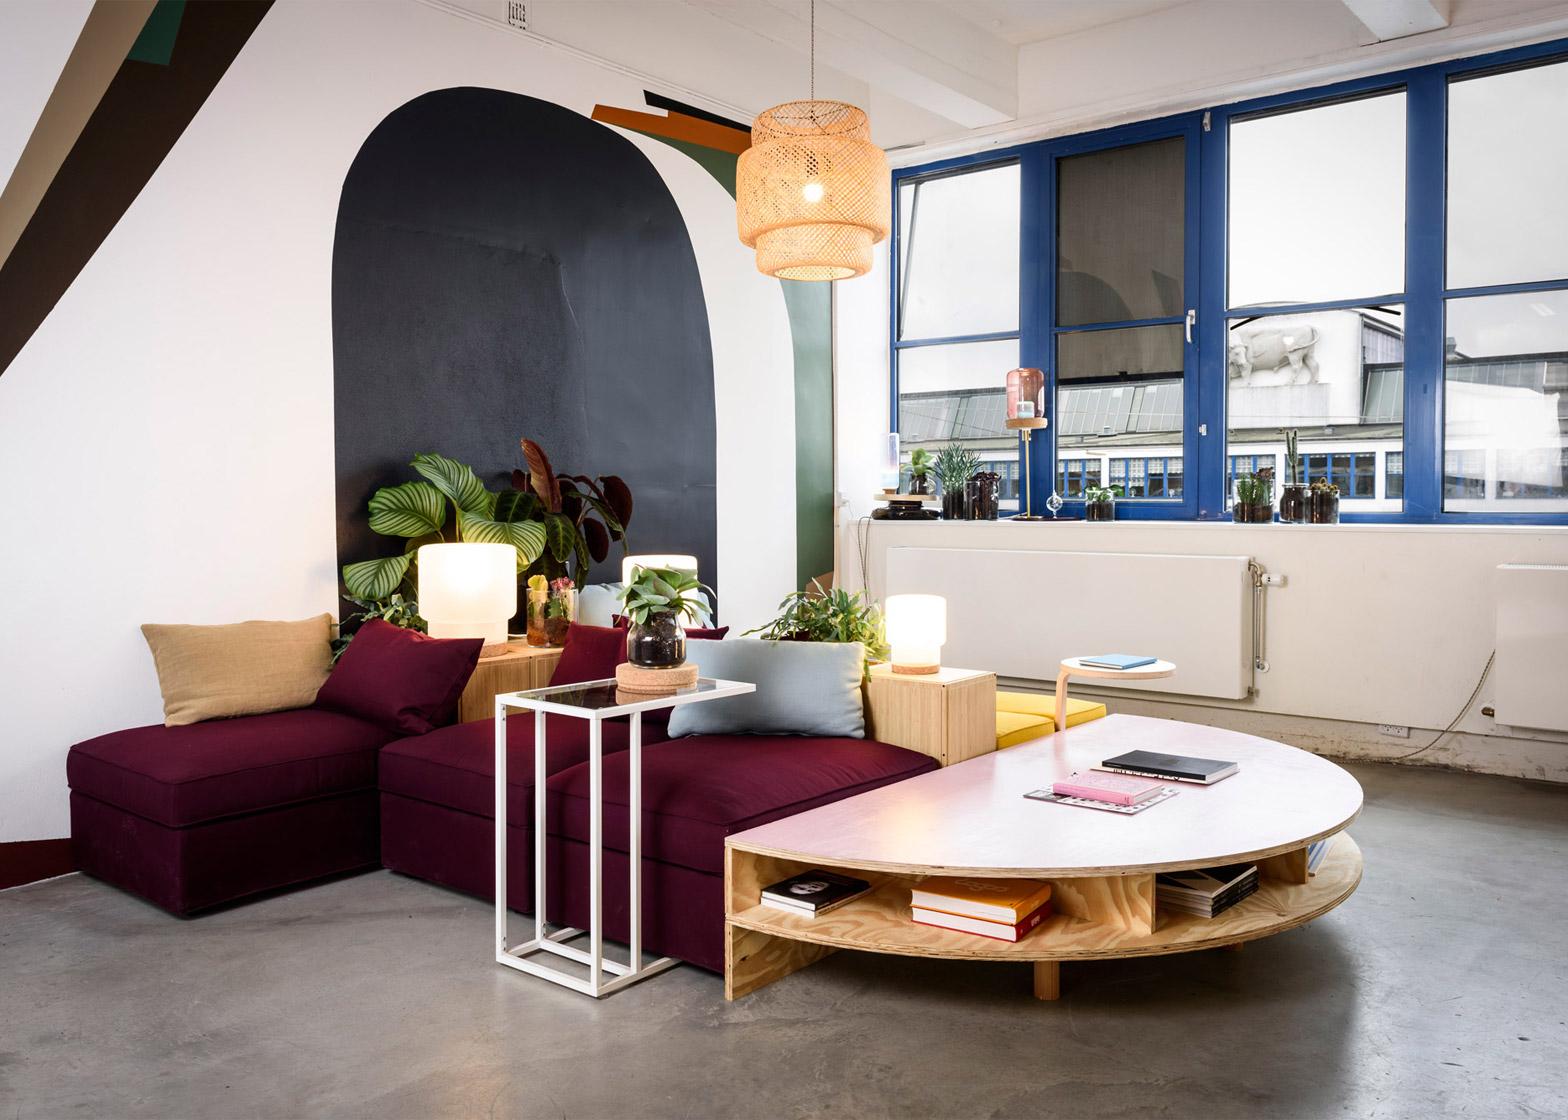 Ikea-Space-10-Innovation-Lab_Alastair-Philip-Wiper_dezeen_1568_8